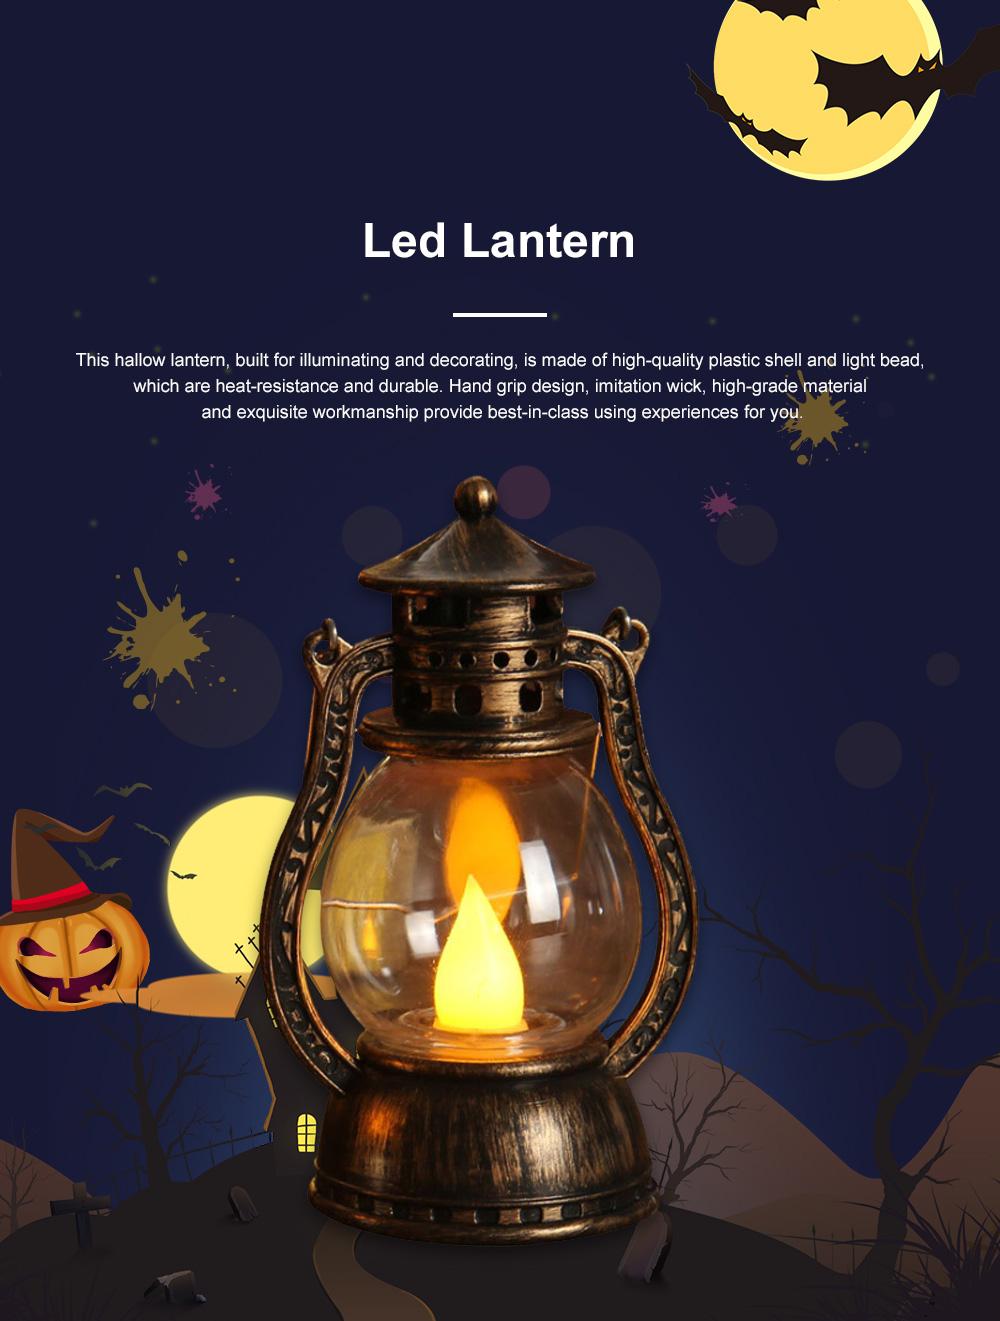 Vintage Stylish Decoration Lantern LED Light with Imitation Wick Creative Bar Courtyard Lamp New Year Ornament 0